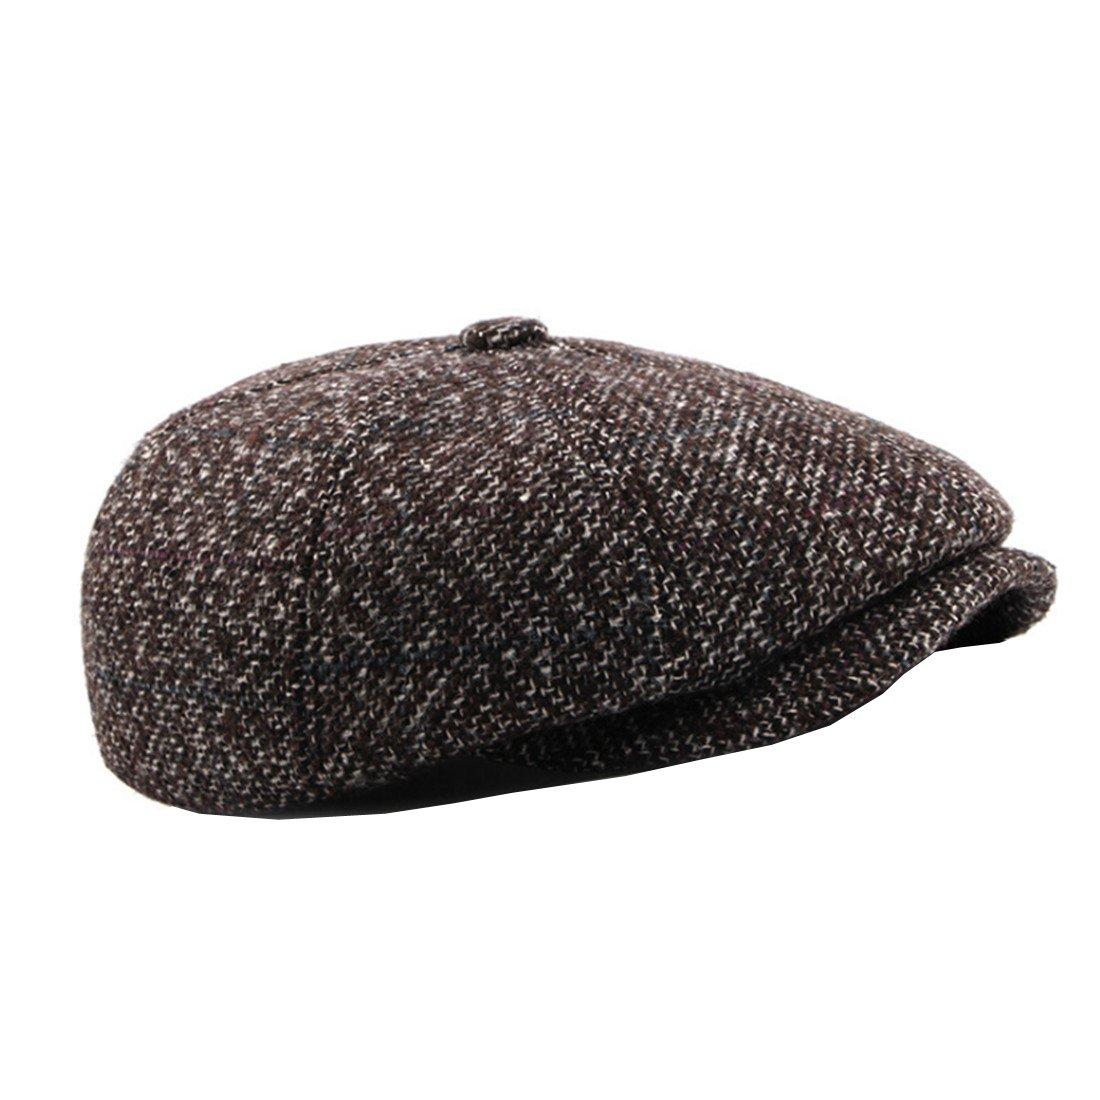 ACVIP Men's 8 Panels Newsboy Cap Cabbie Hat with Ear Flap YG12968-1